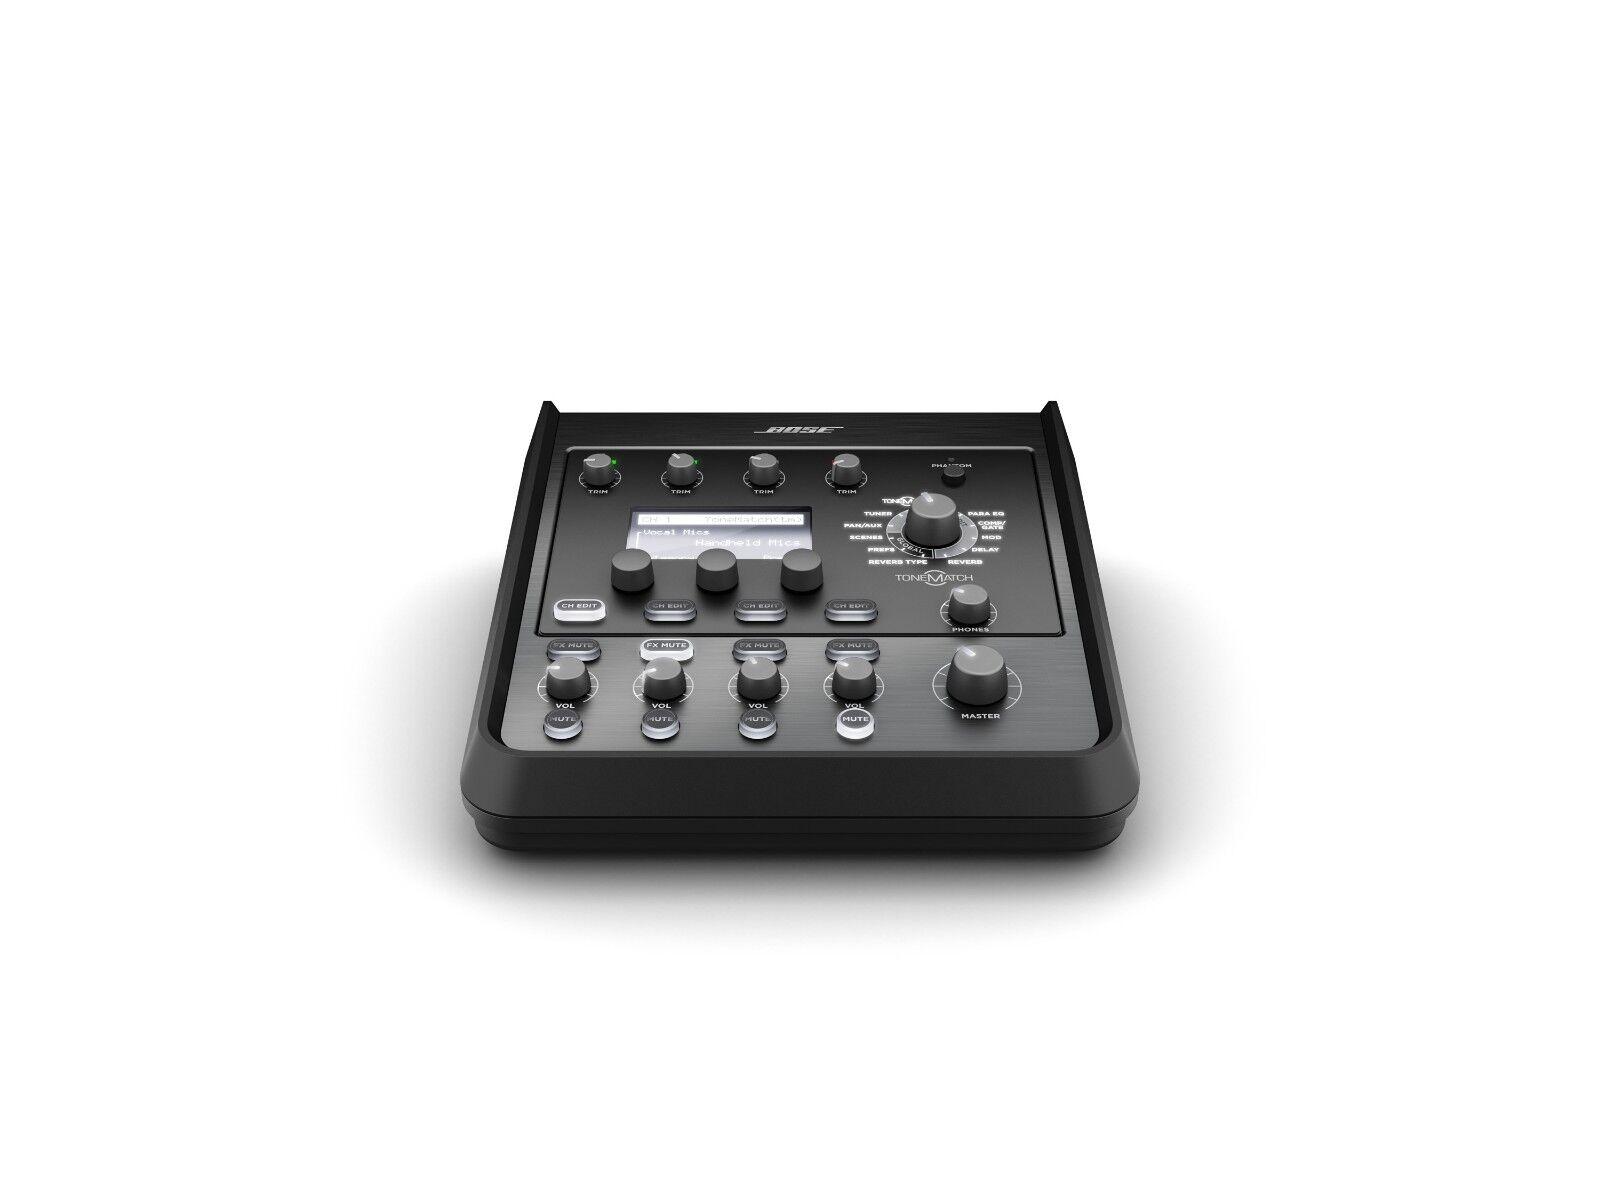 Bose T4S ToneMatch Audio Engine Mixer - New